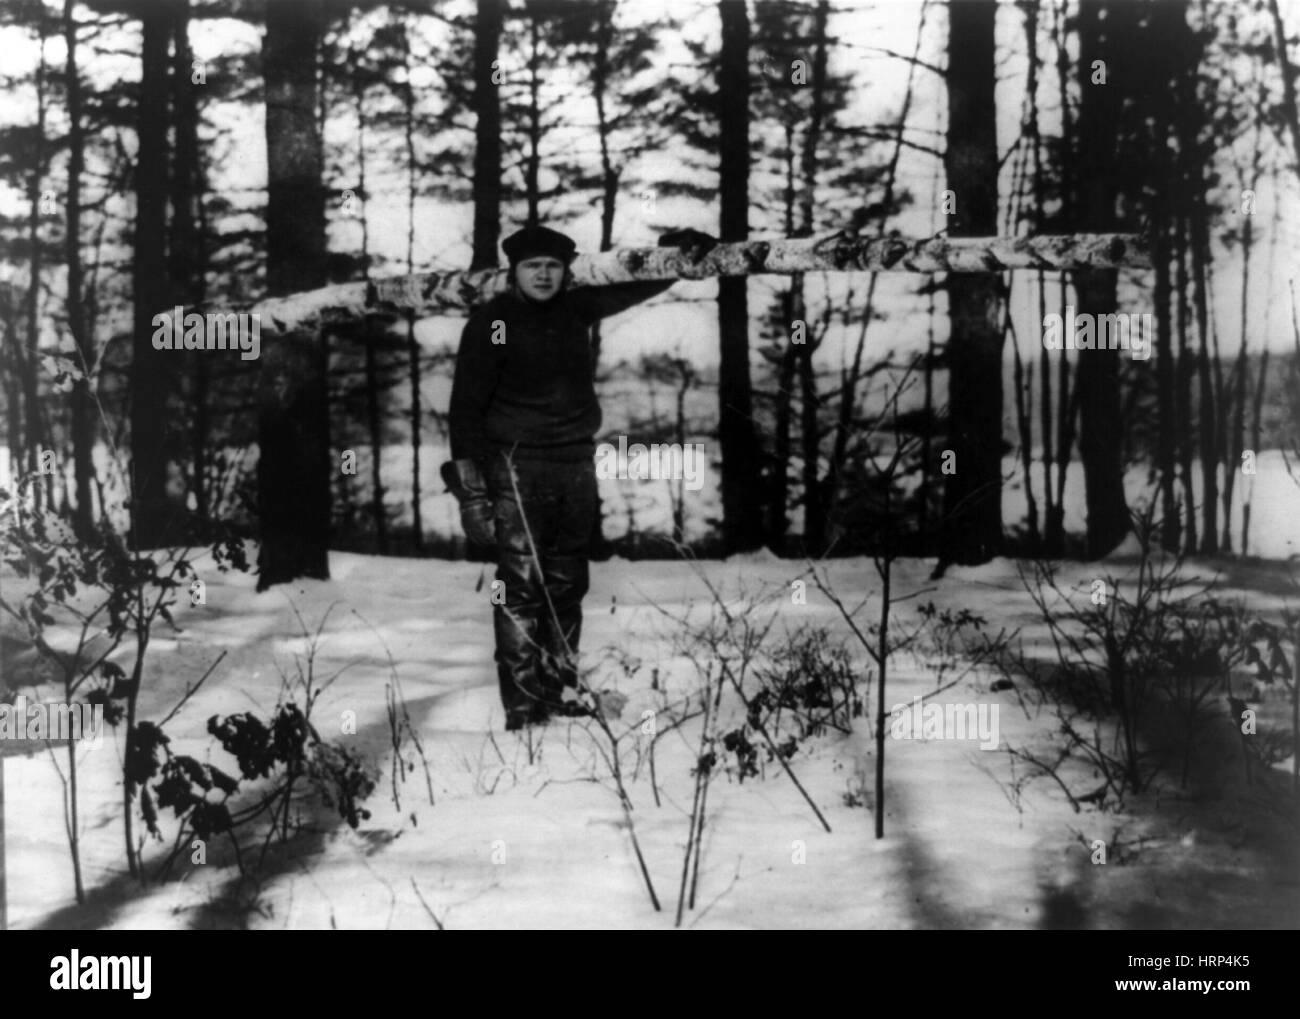 Babe Ruth, American Baseball Legend - Stock Image